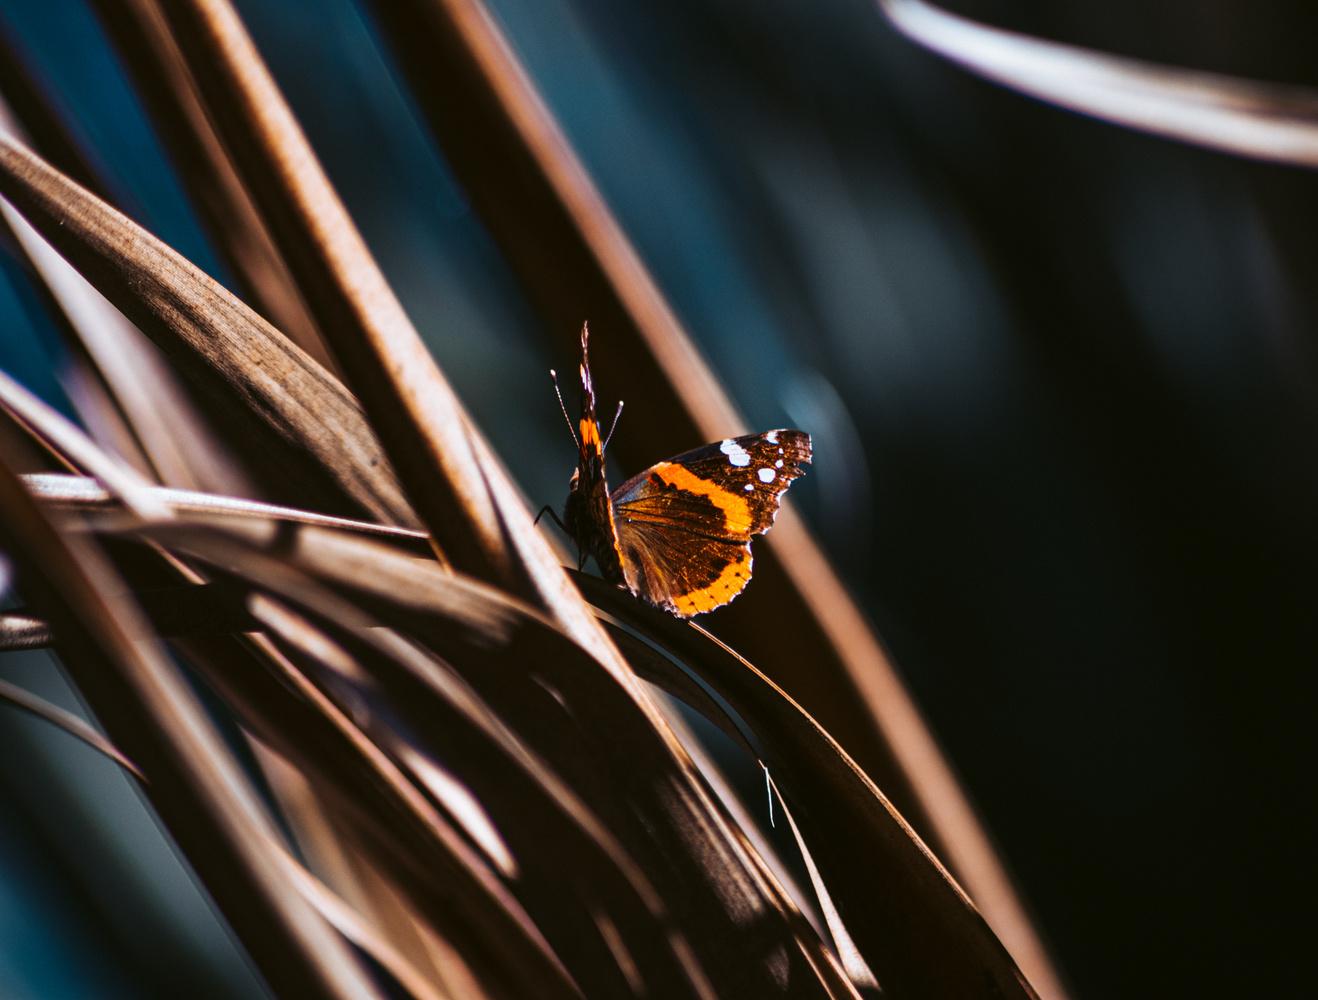 Autumn Butterfly by Violet Trujillo